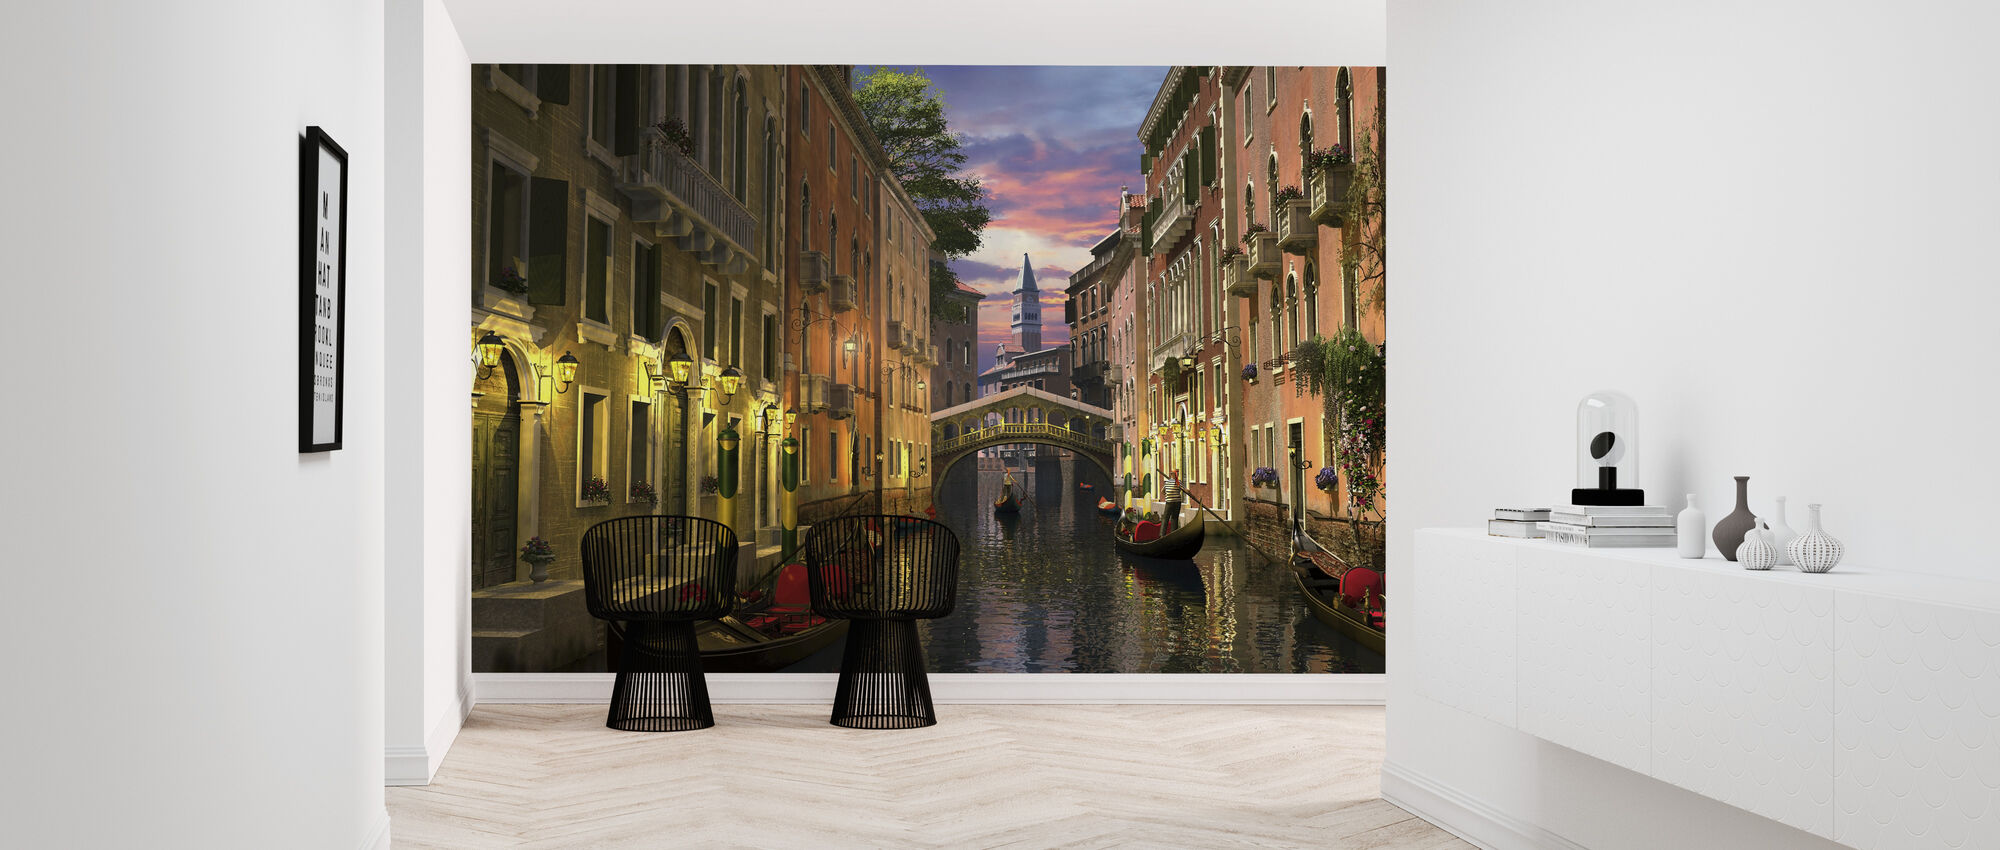 Venice at Dusk - Wallpaper - Hallway